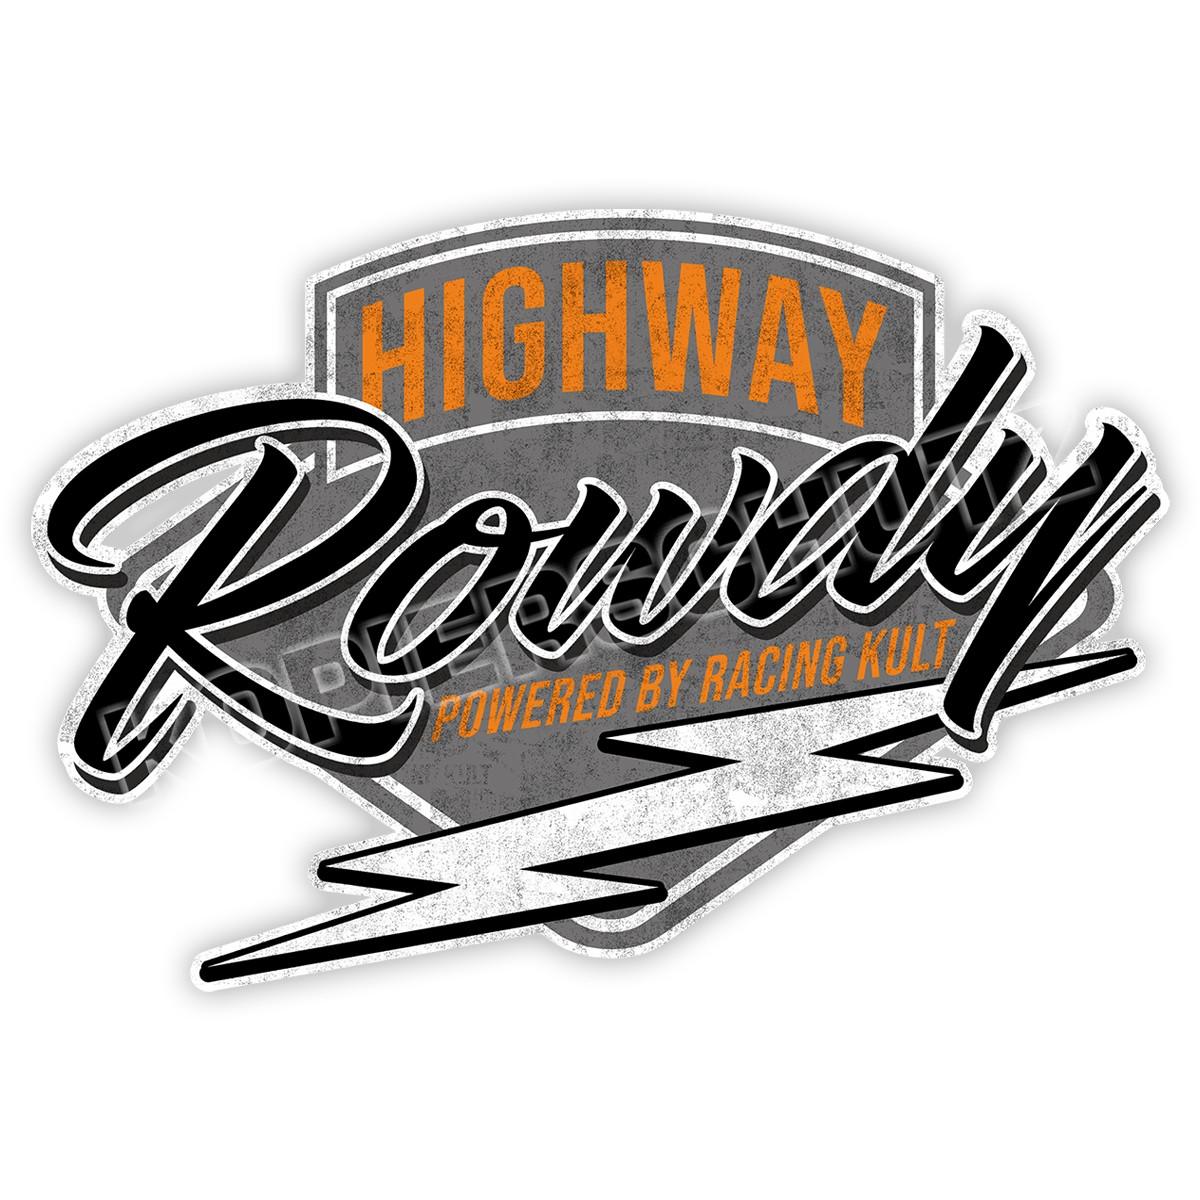 Racing Kult Highway Rowdy Sticker Aufkleber